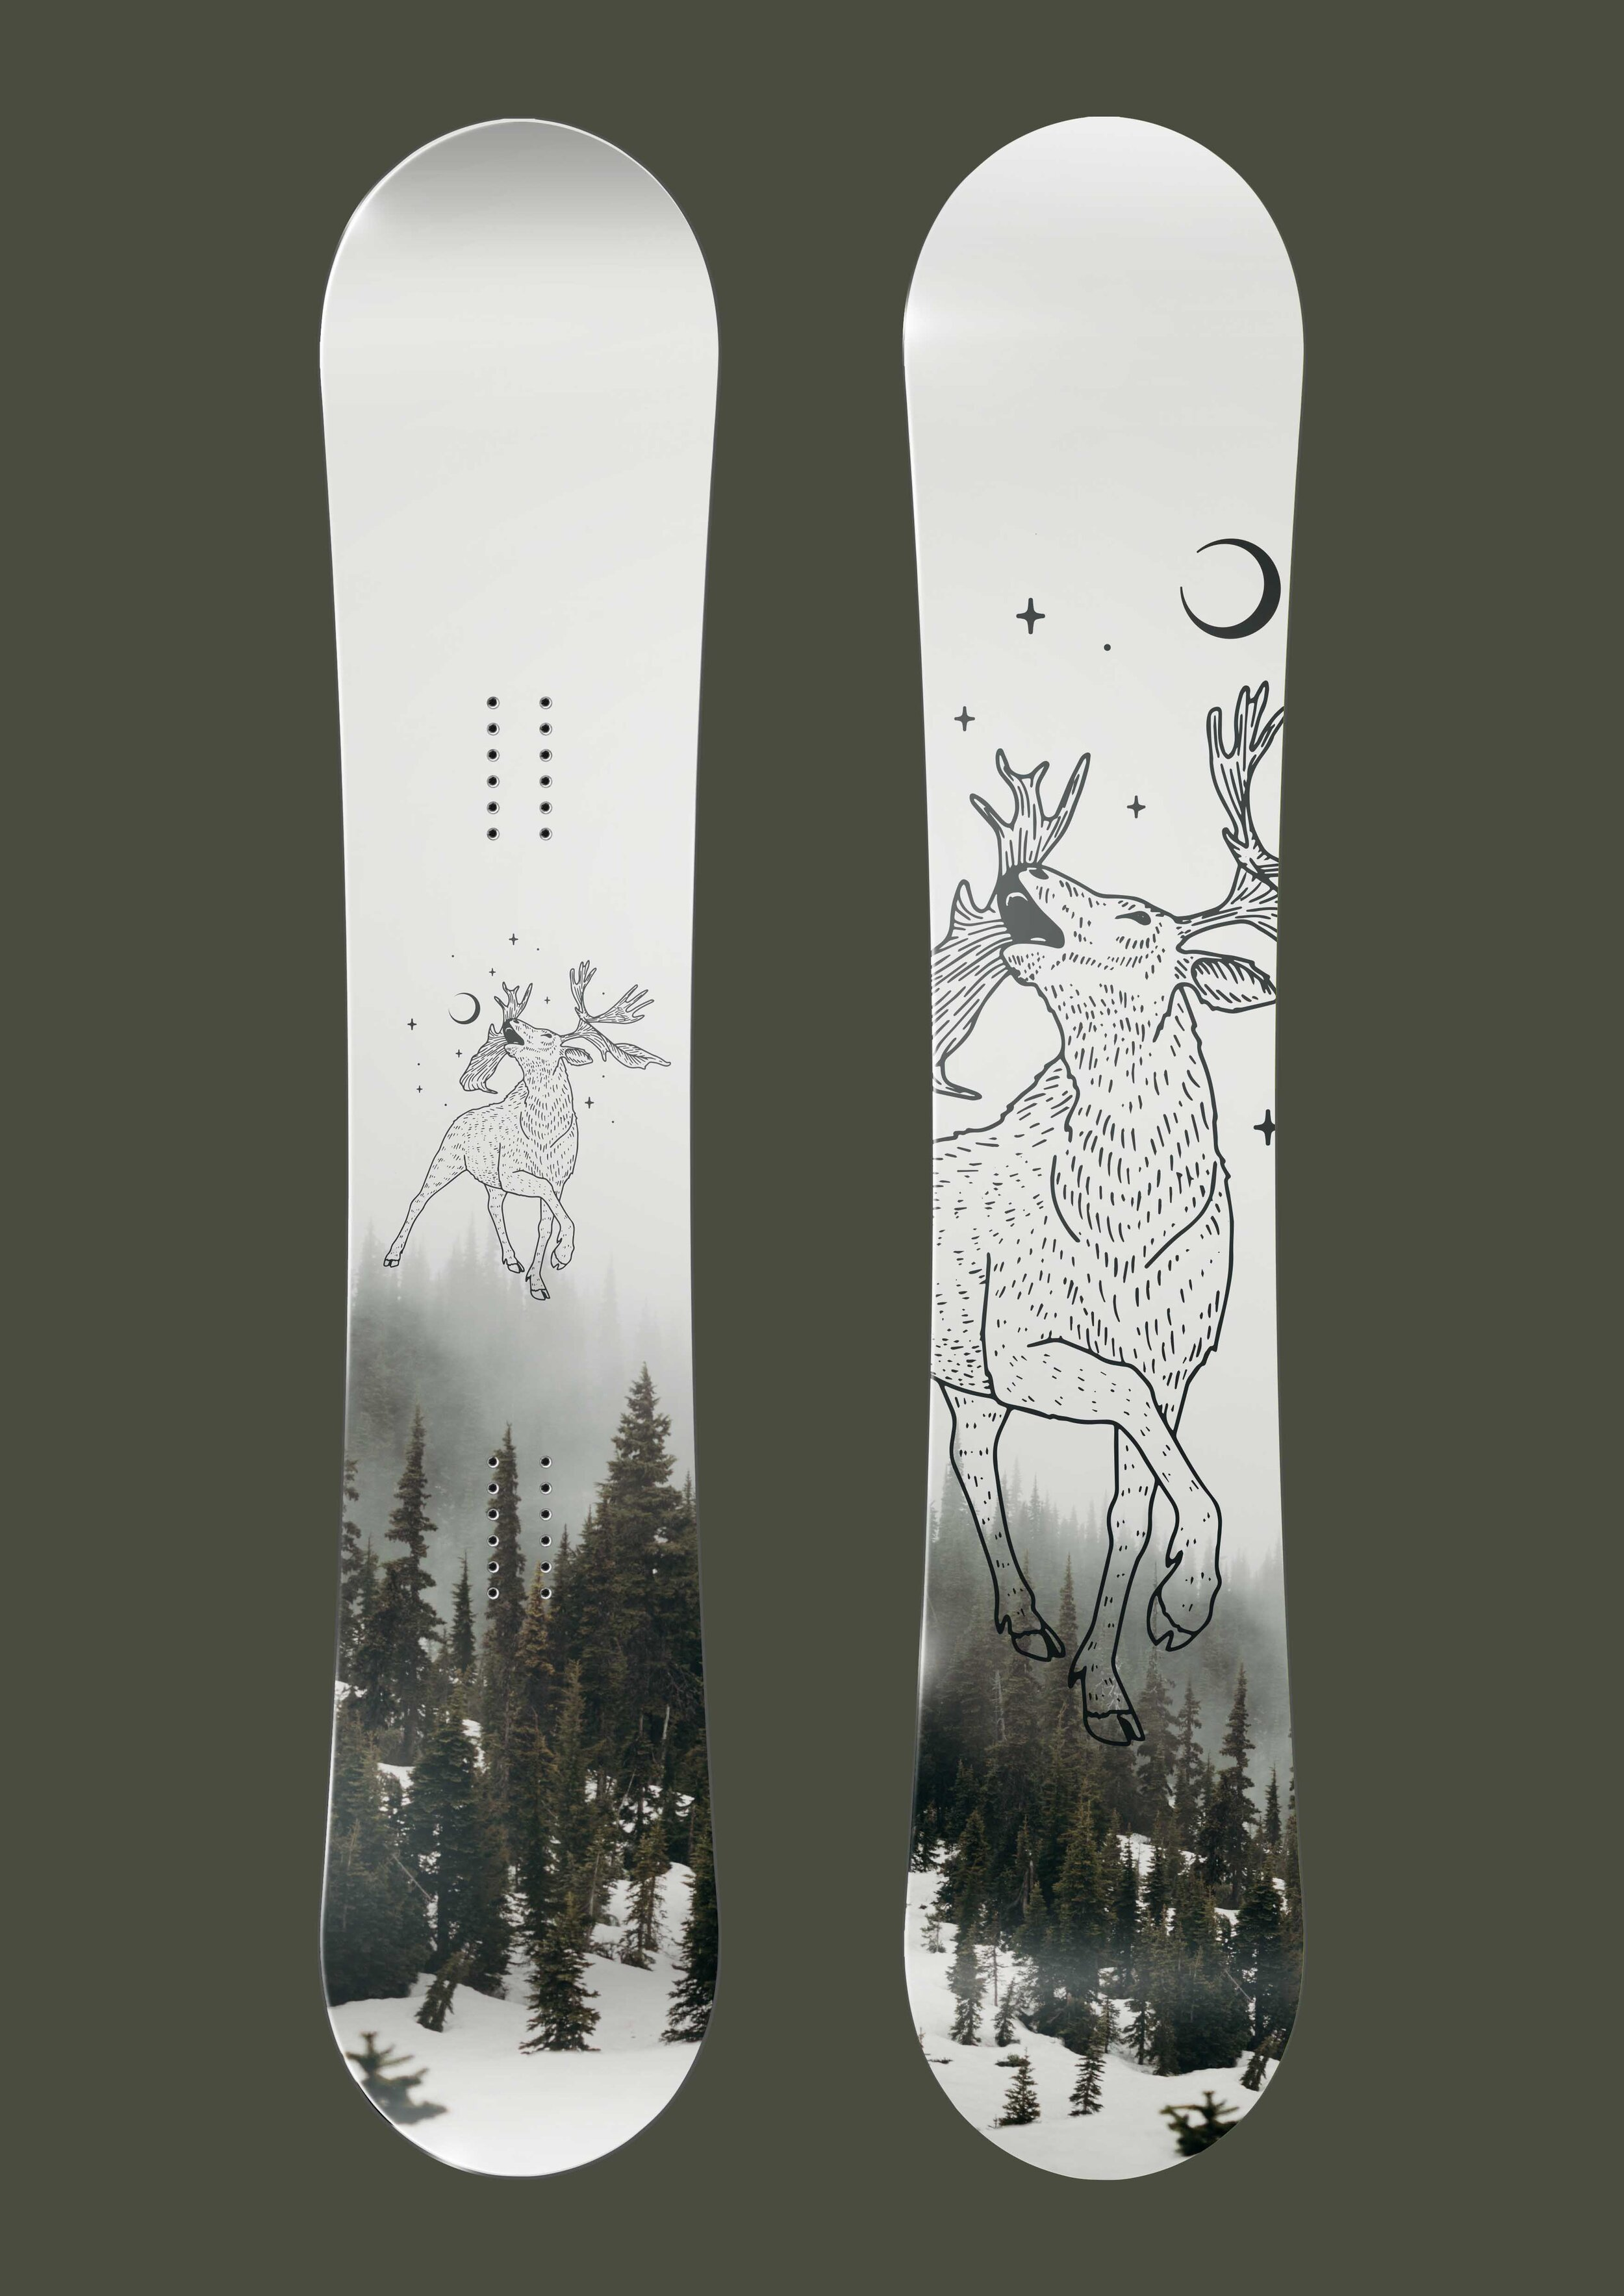 new_snowboard_template_by_nunosk8 Moose.jpg